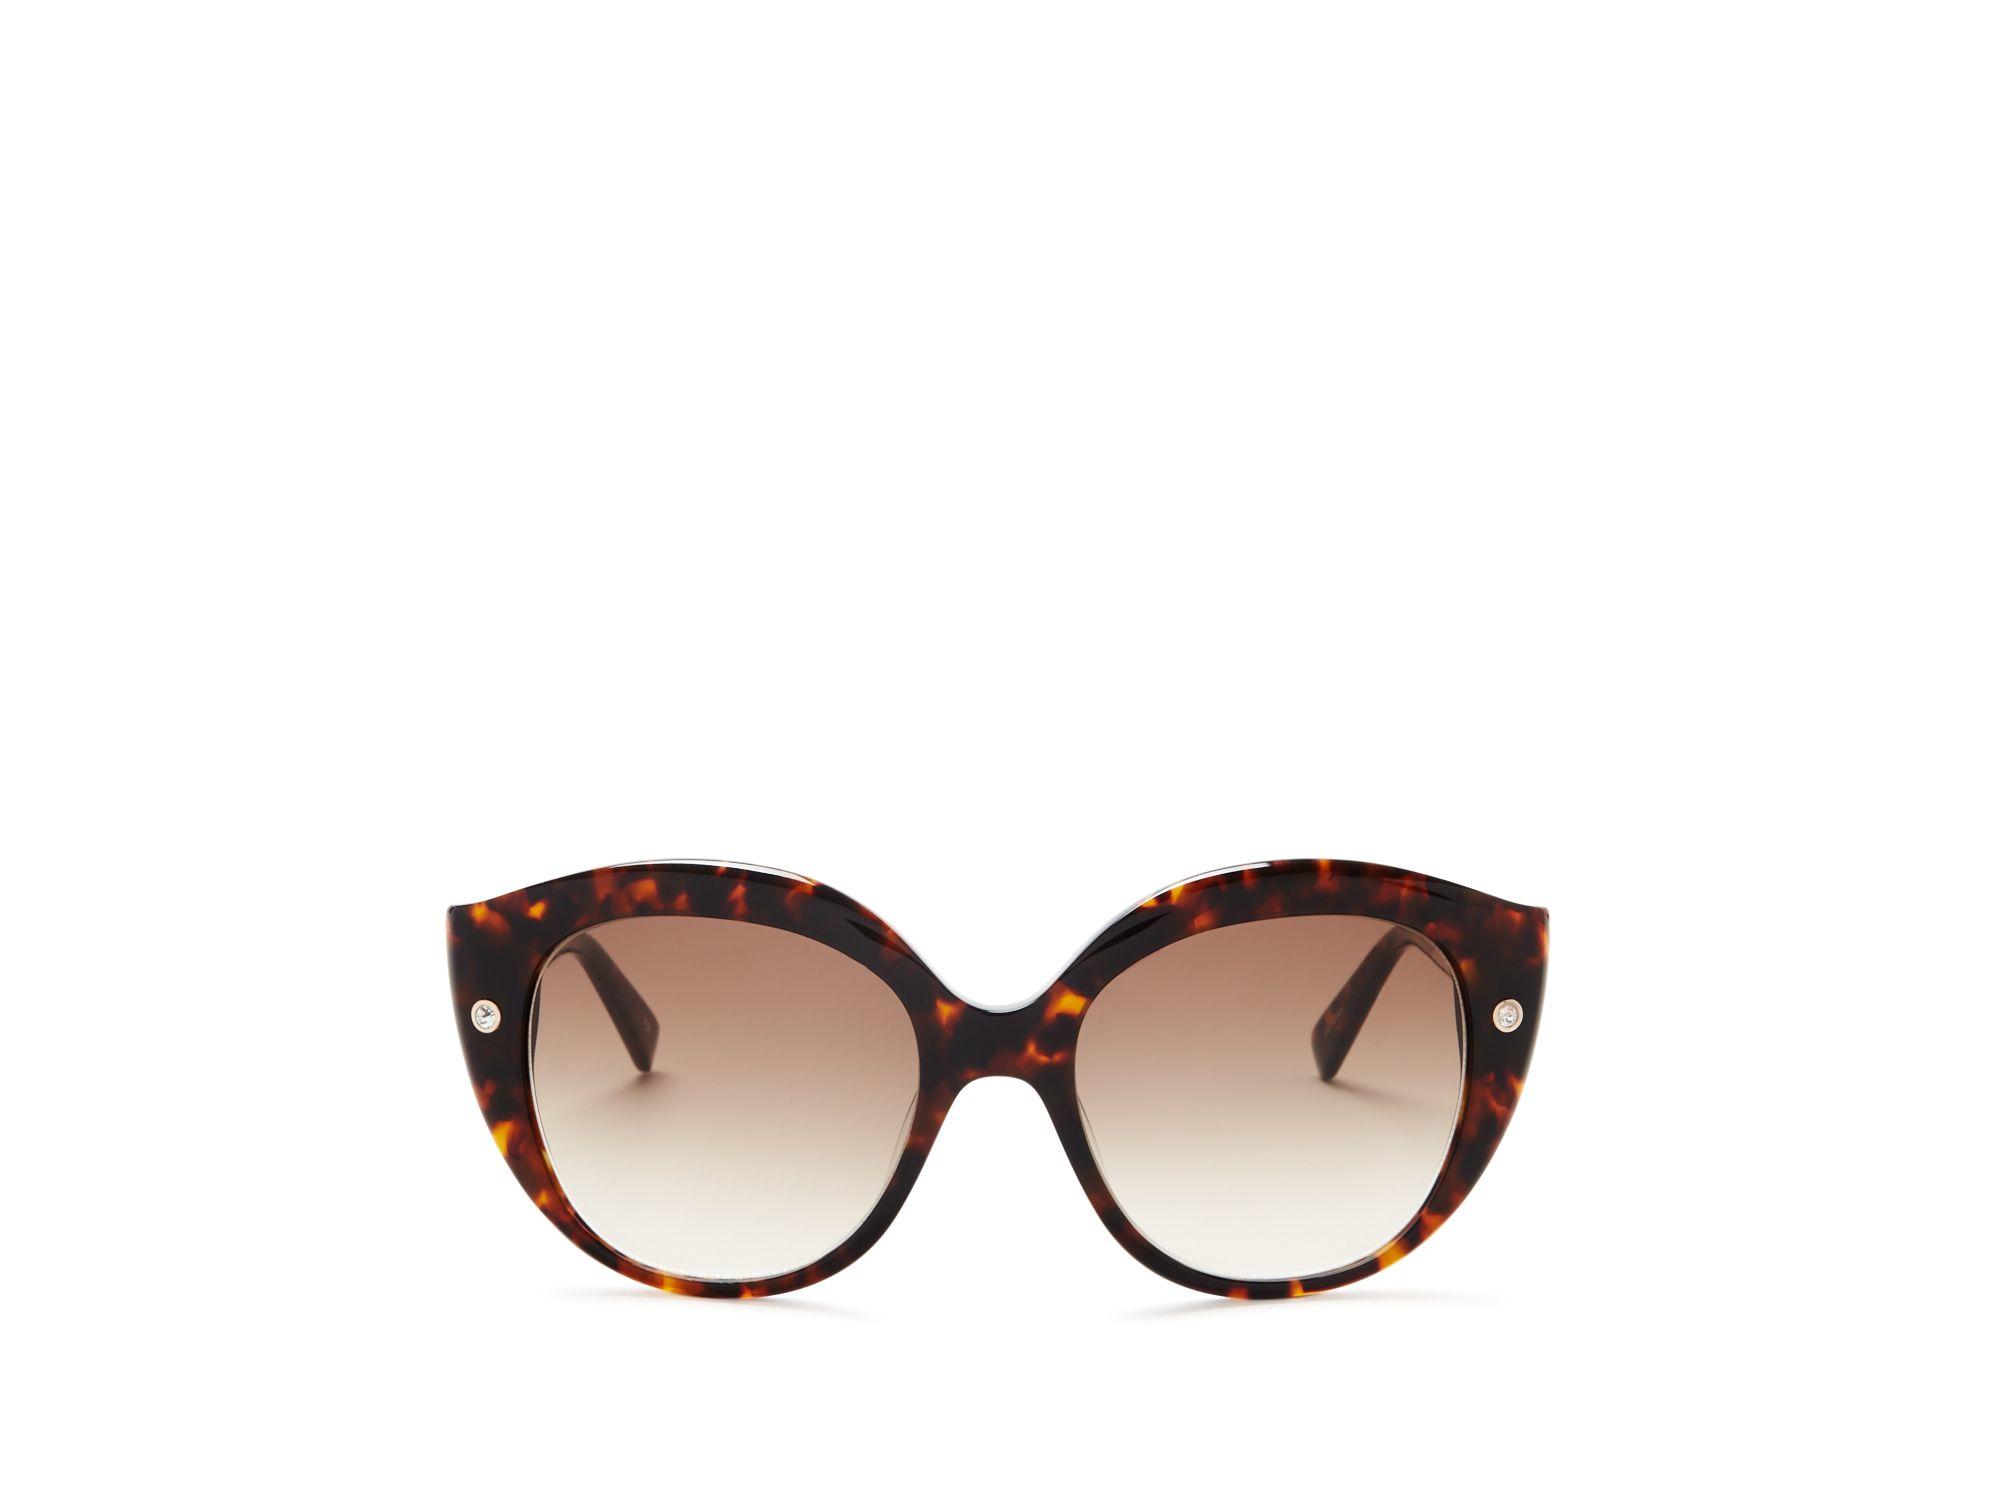 Kate Spade Promotional Code >> Kate spade Kaele Oversized Cat Eye Sunglasses, 55mm in Brown   Lyst